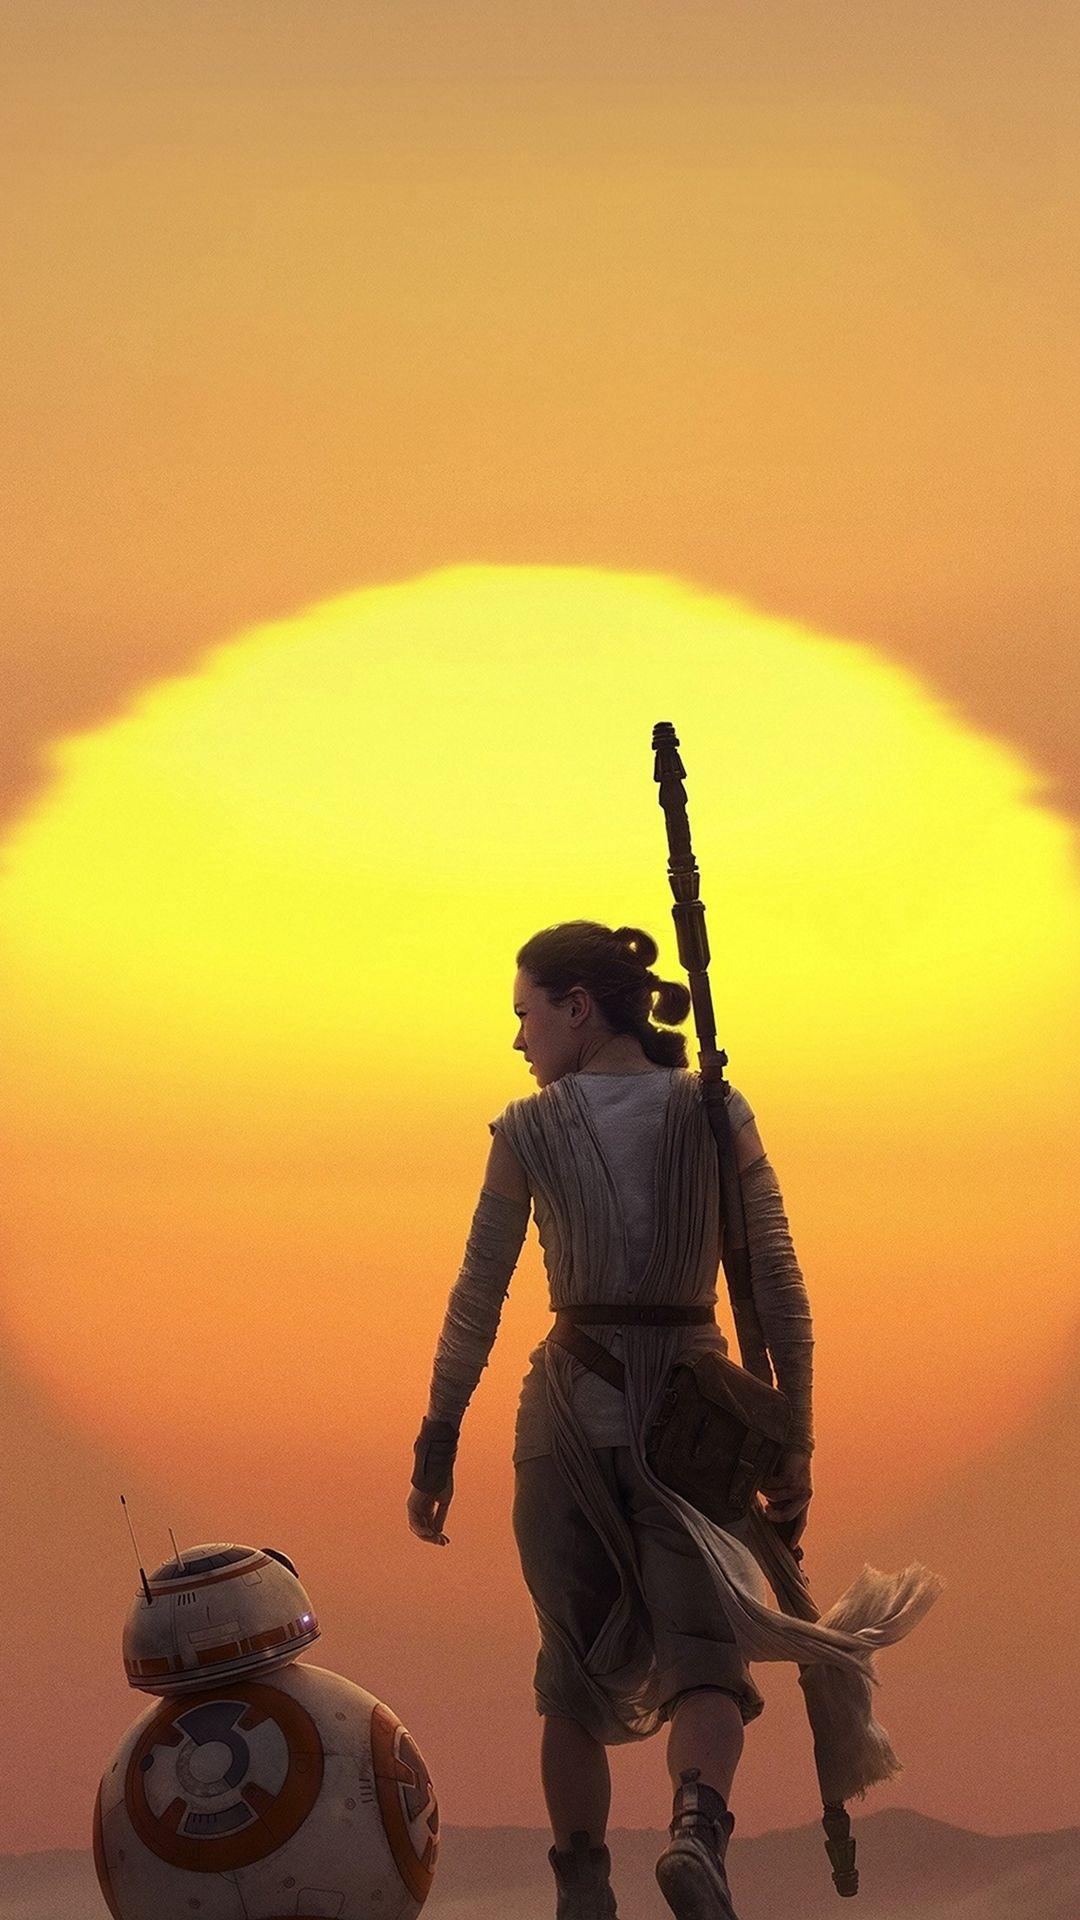 Star Wars Force Awakens Rey ★ Download more Star Wars